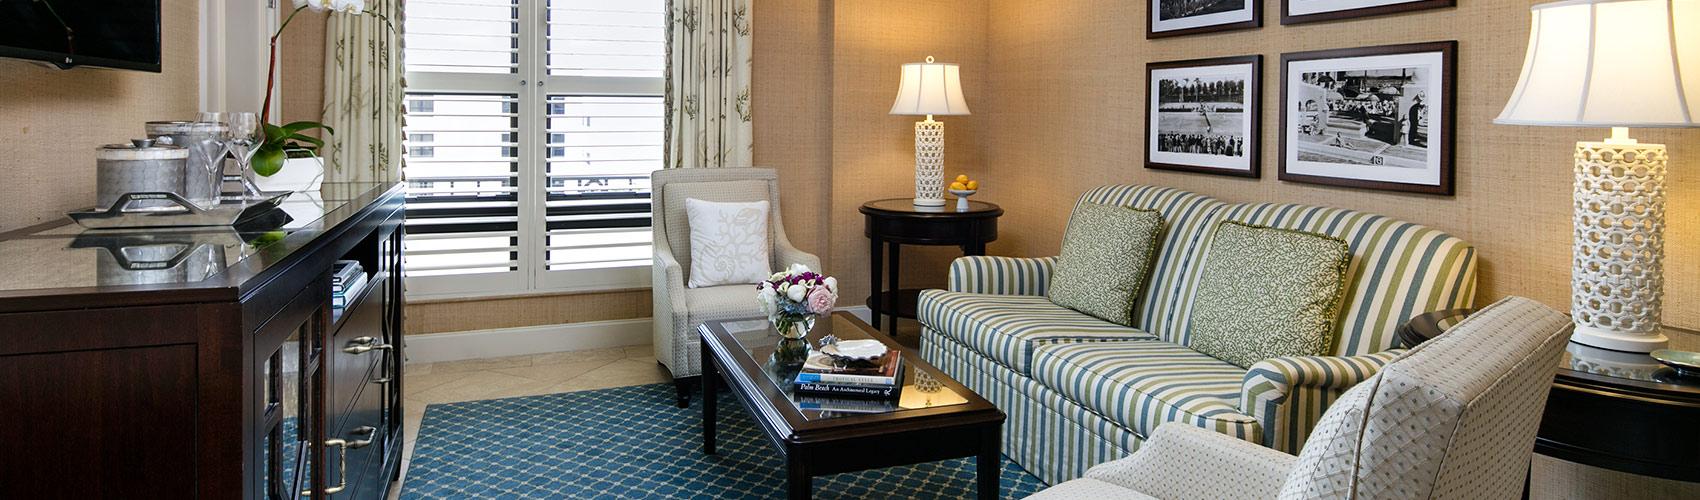 Deluxe Suite sitting room